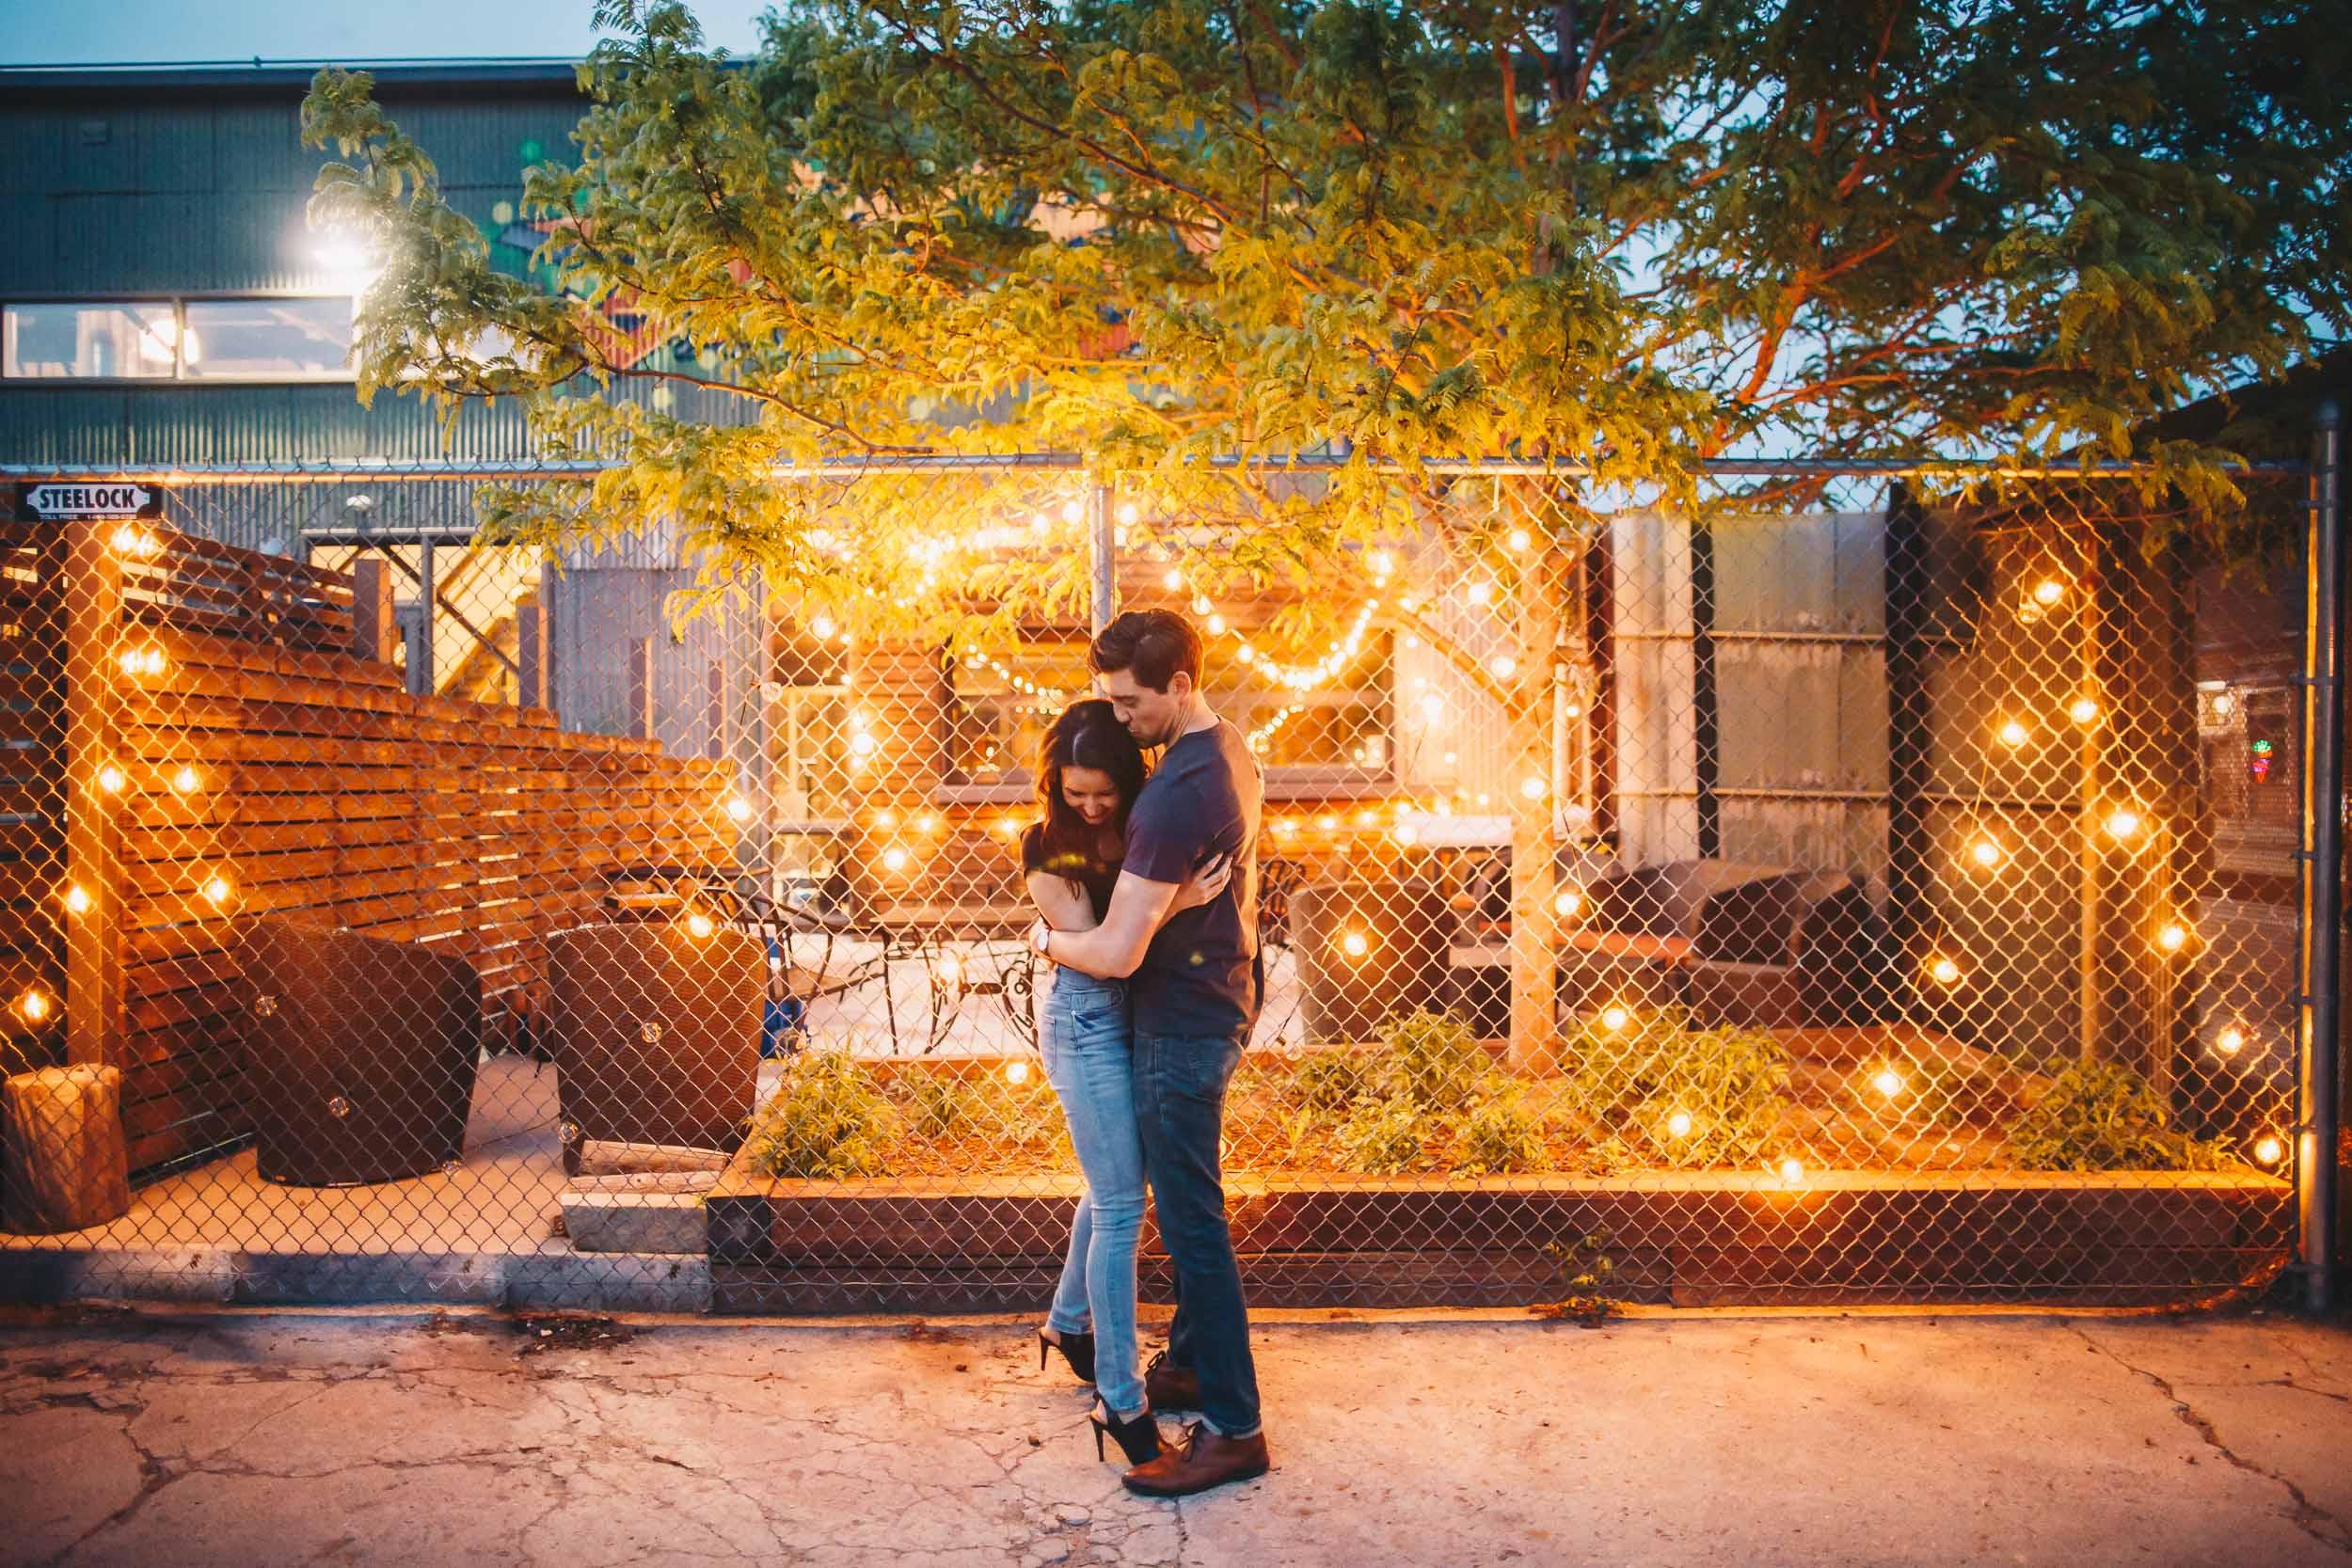 Blog-Marissa and Josh Engagement 5.6.18-100.jpg